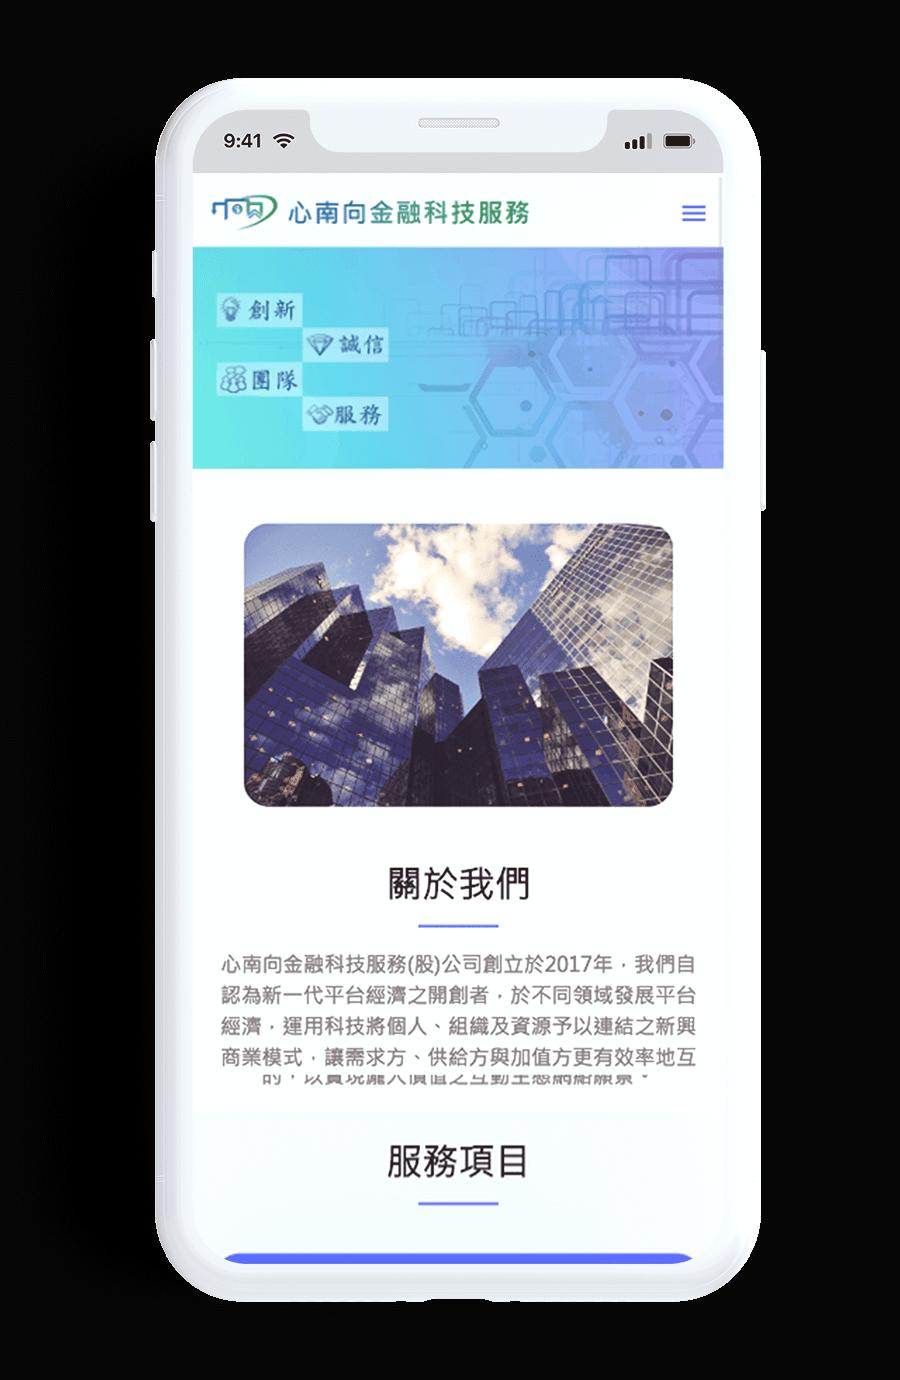 UIUX | 介面設計 | 掌握最新顯示裝置設備動態,打造兼具最佳使用者體驗及最具品牌特色的介面設計!